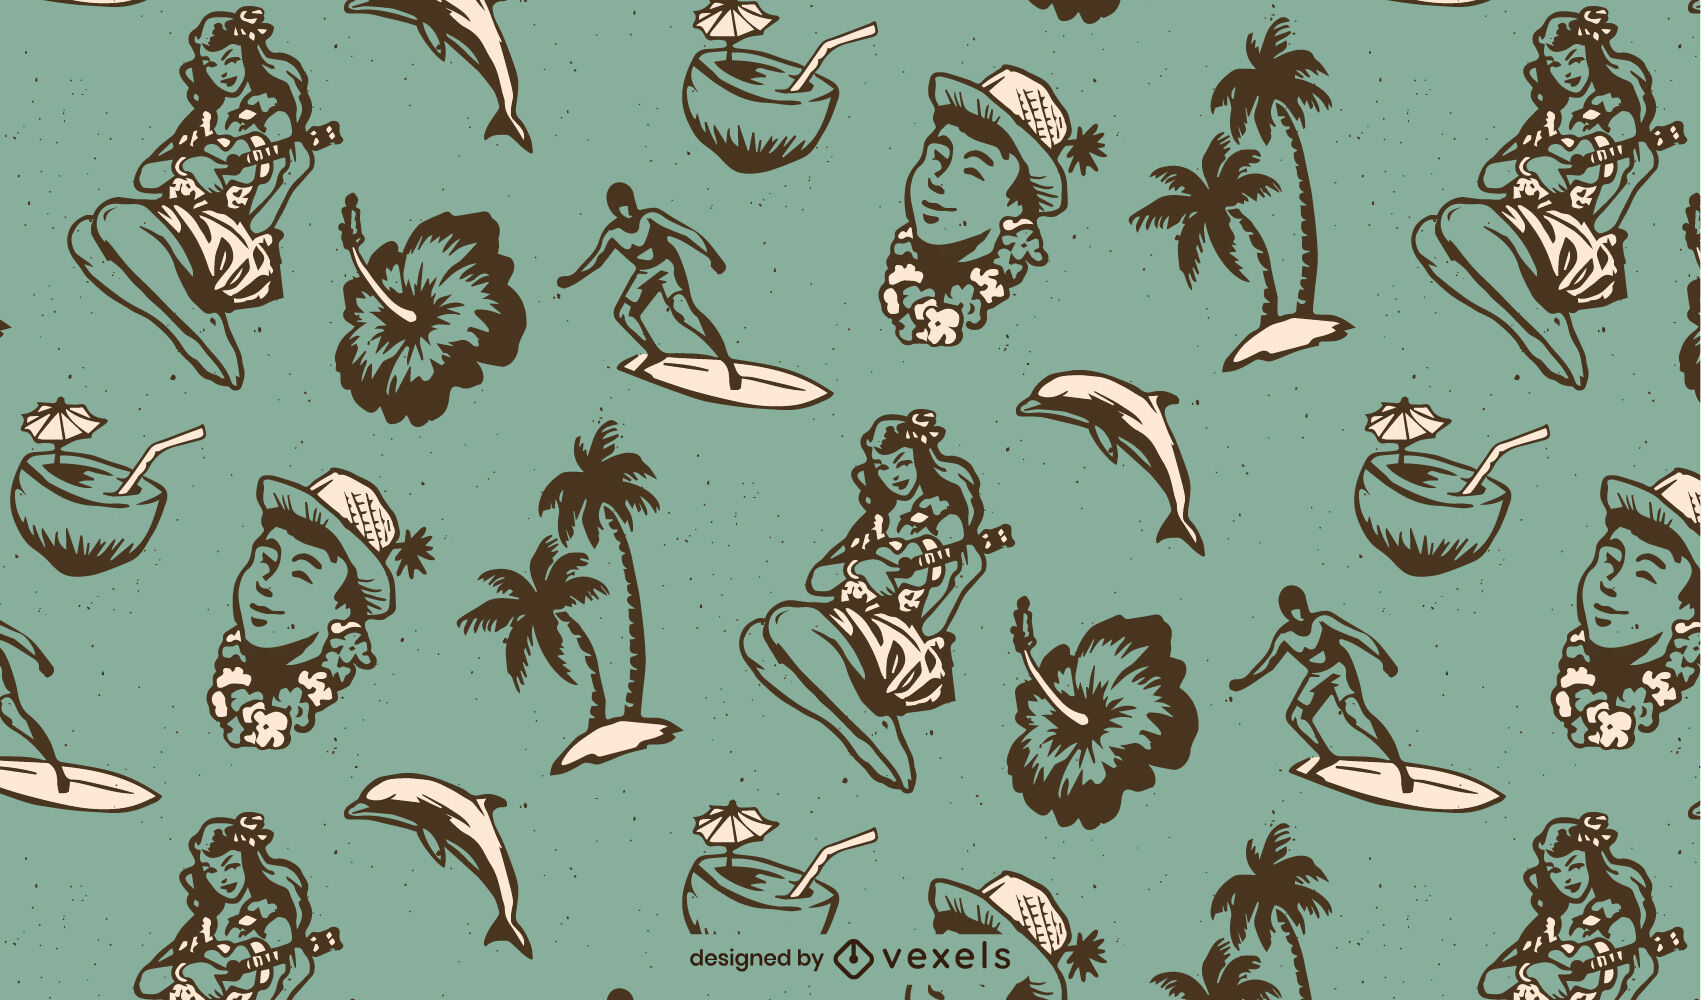 Padrão de elementos havaianos vintage